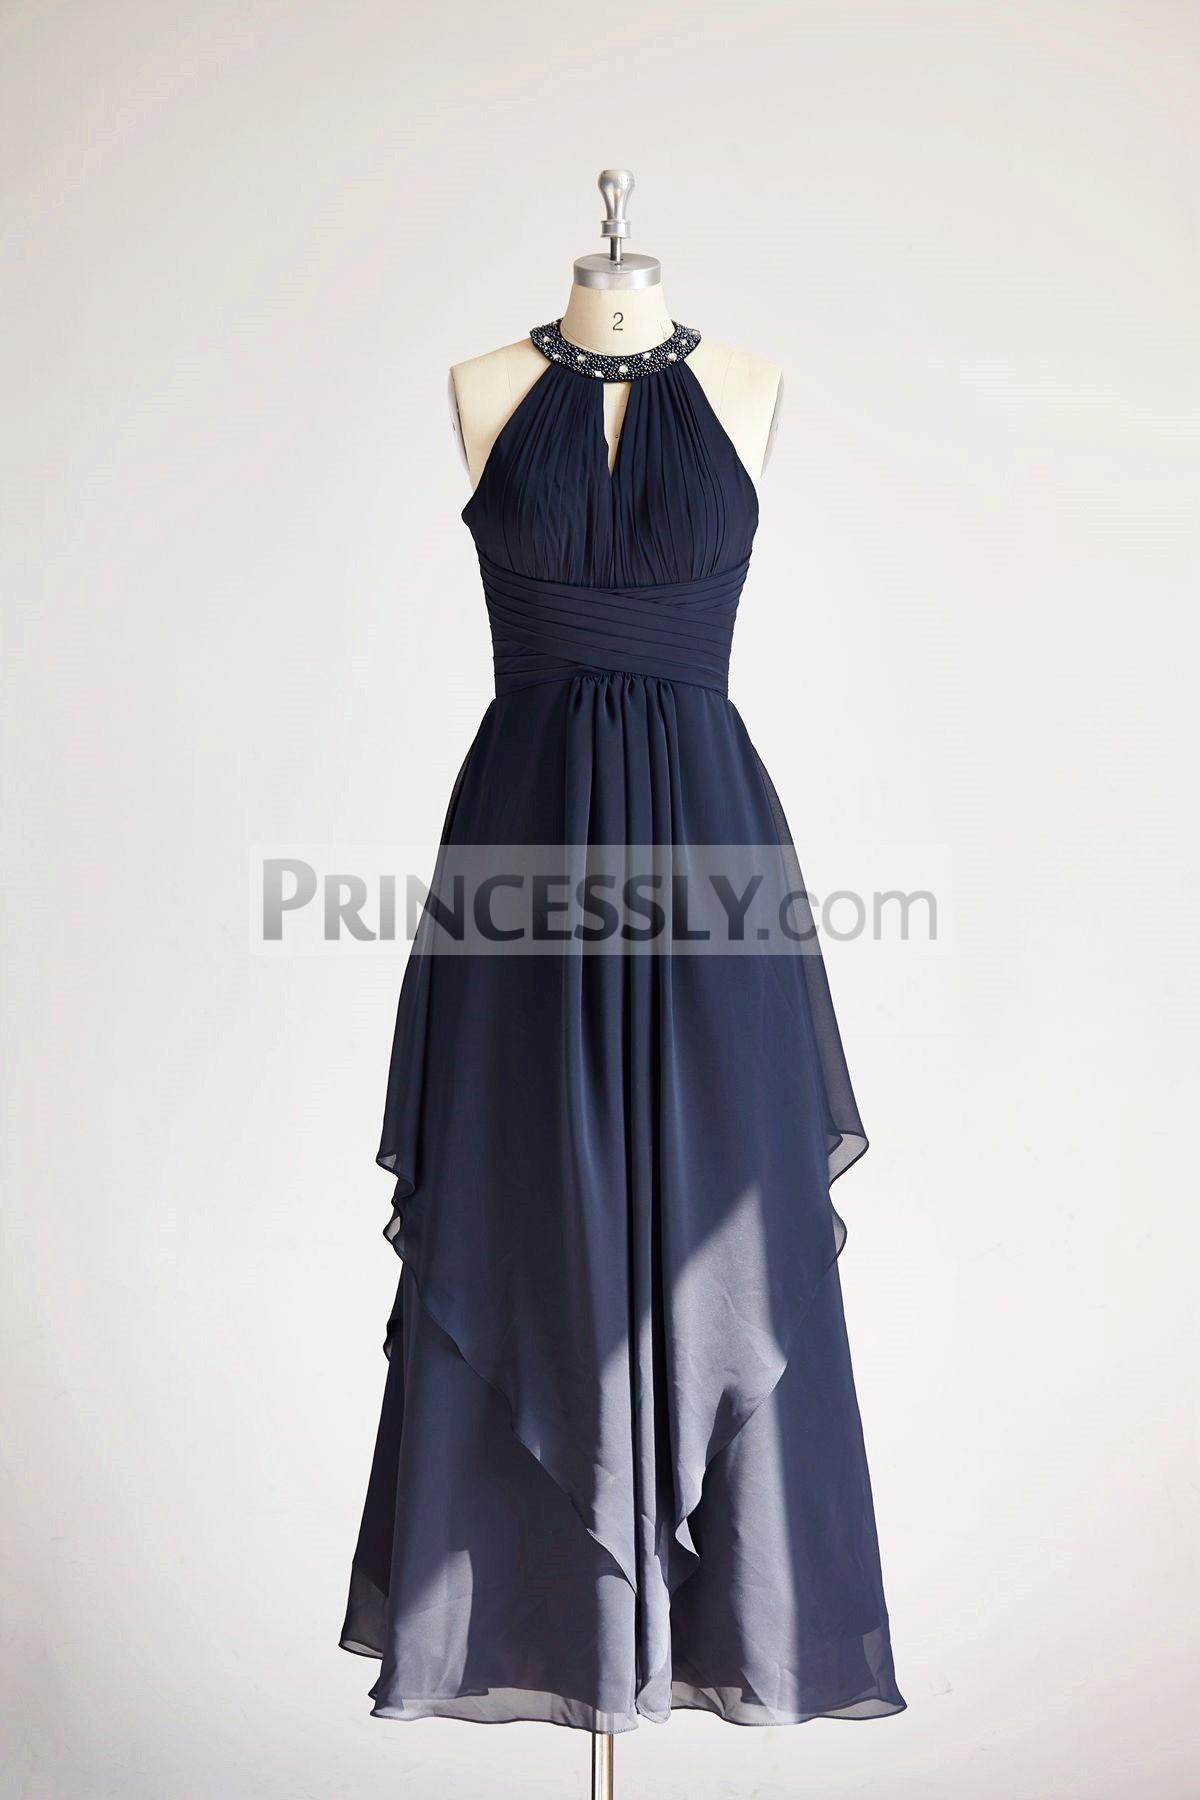 Princessly.com-K1000315-Halter Navy Blue Beaded Chiffon Long Wedding Bridesmaid Dress-31